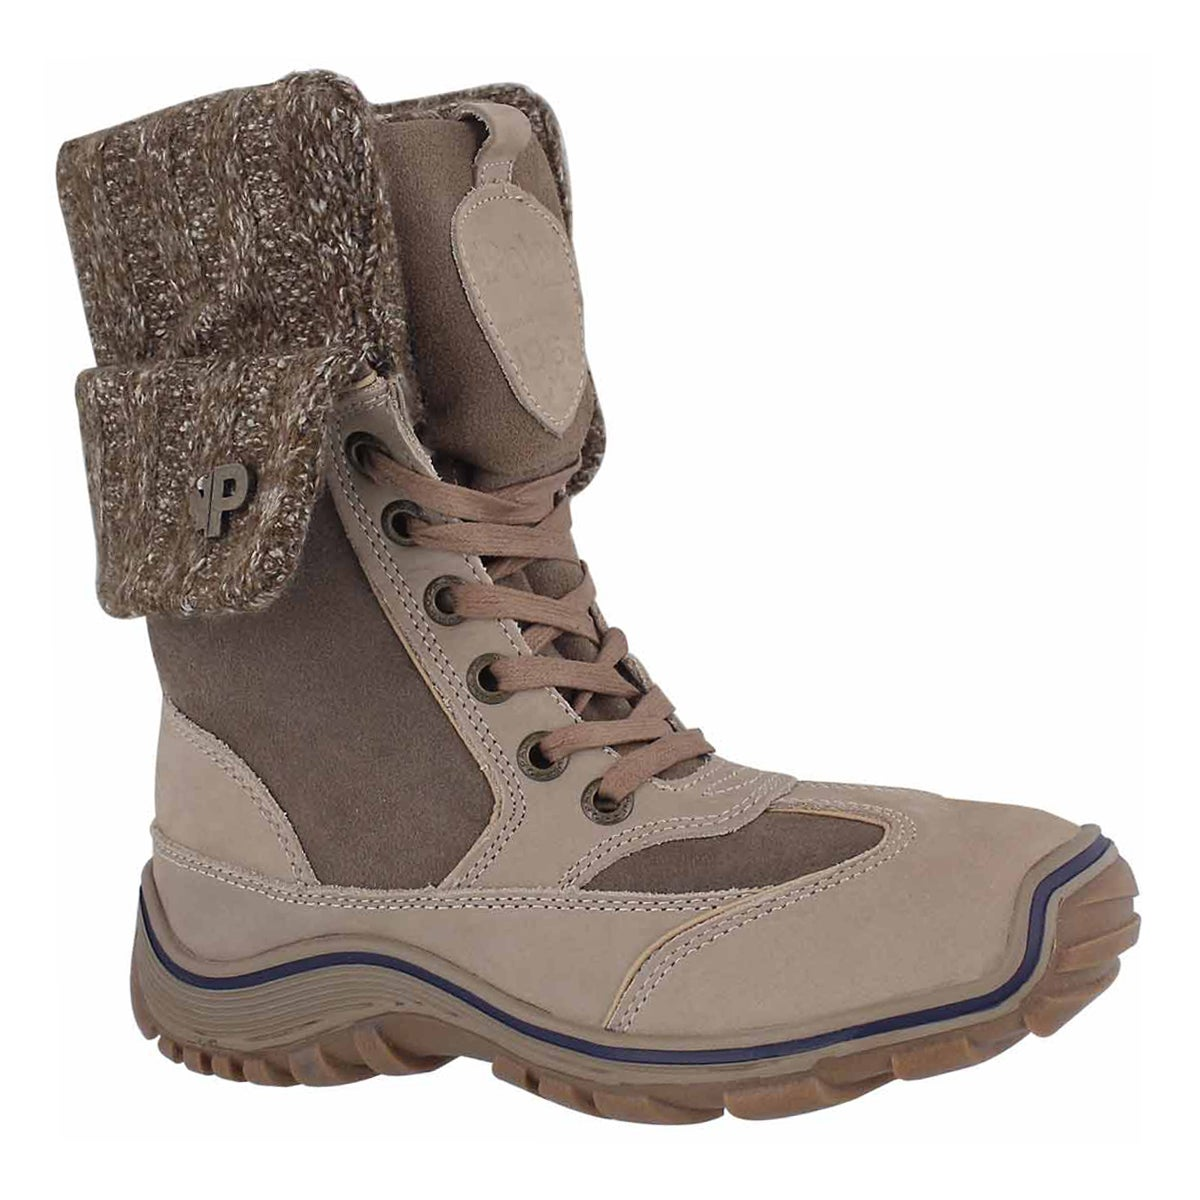 Women's AVA honey/dark brown wtpf winter boots